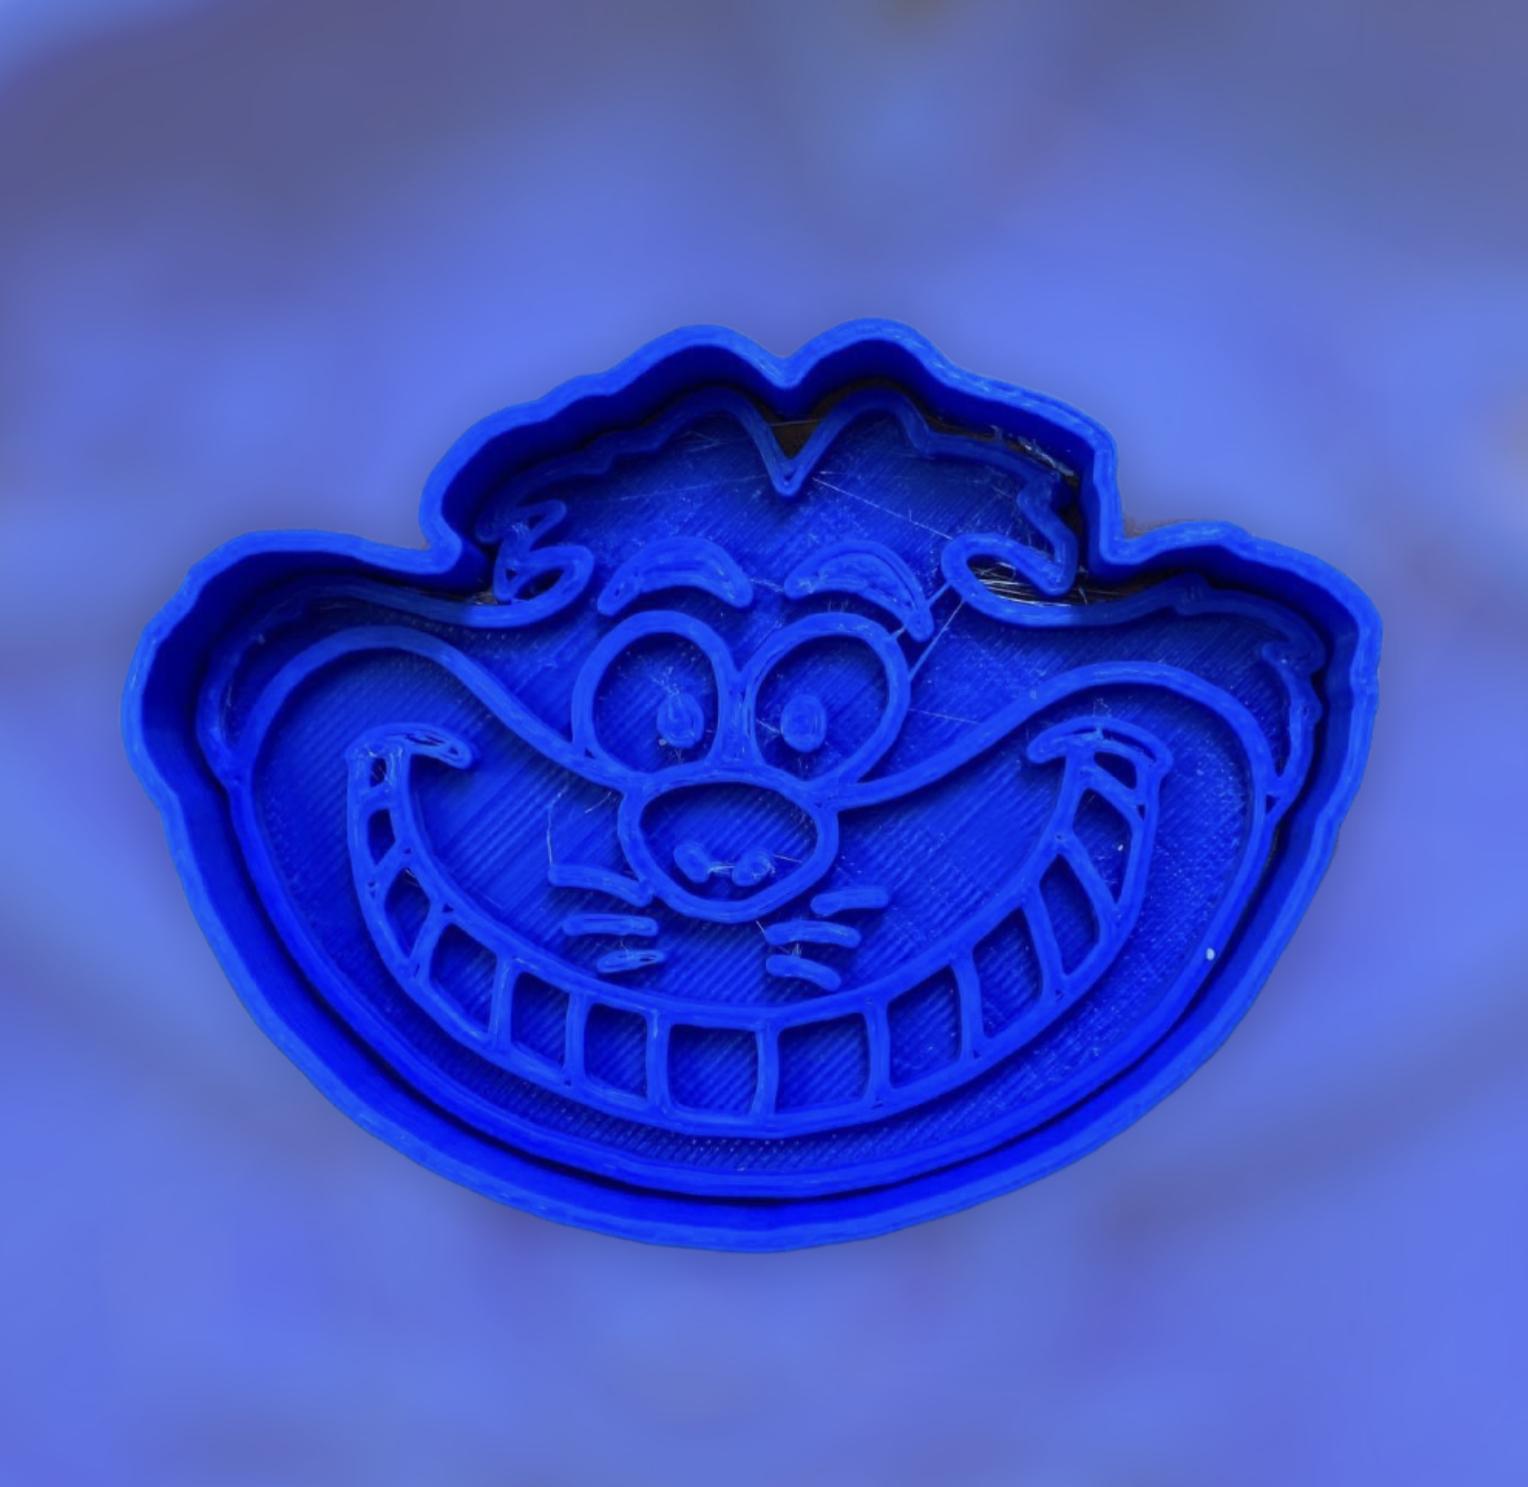 36B13322-4ACE-4E55-A706-2FF5BDAA0806.jpeg Download STL file The Cheshire Cat Cookie cutter • 3D printable template, carloseduardoalfonsogarcia